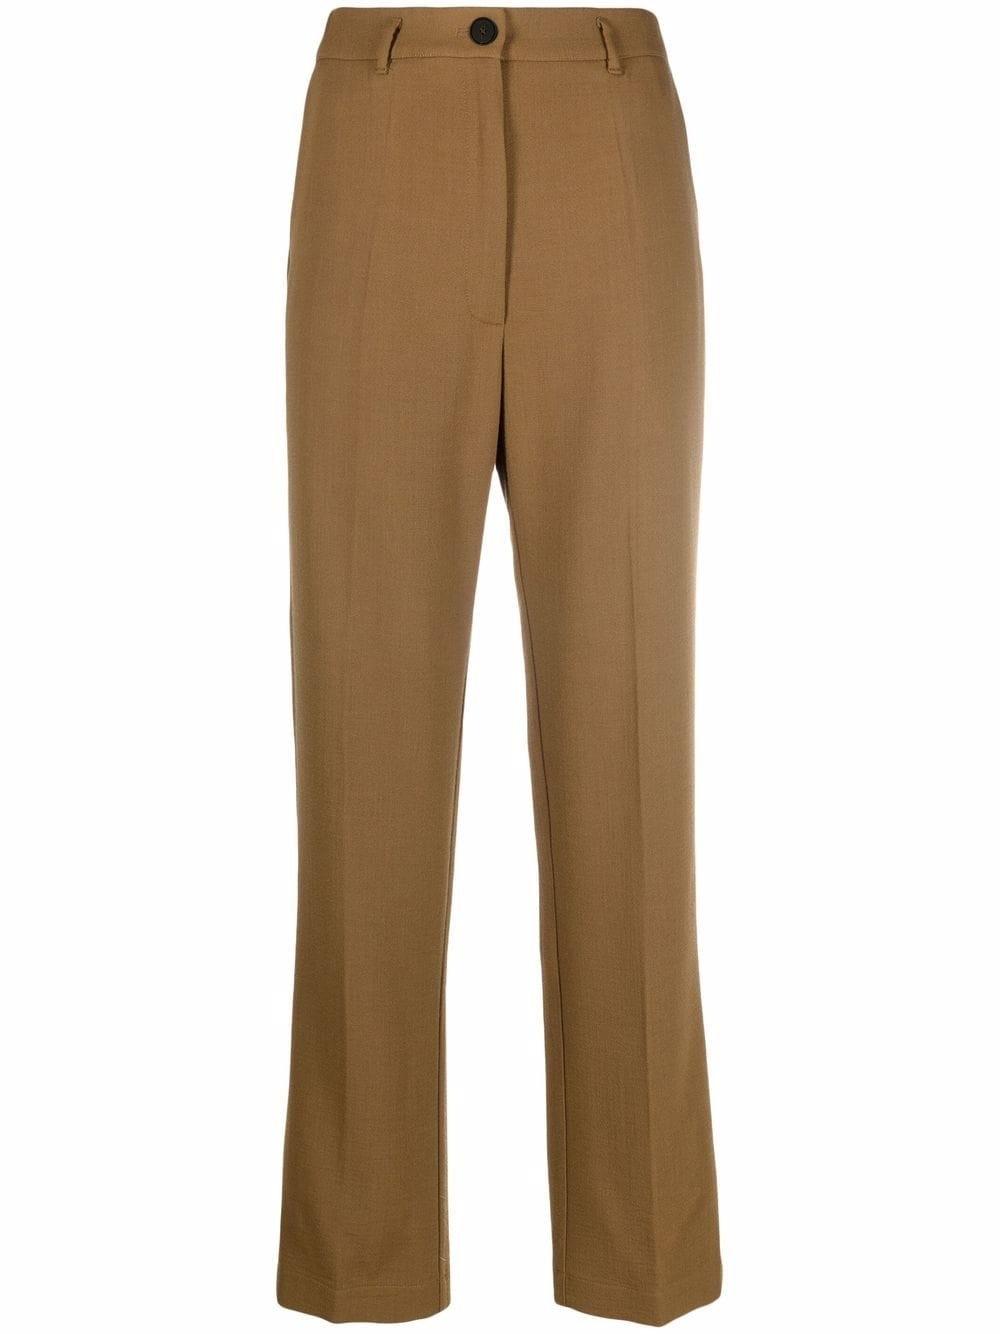 Pantalone doppio crepe lana viscosa